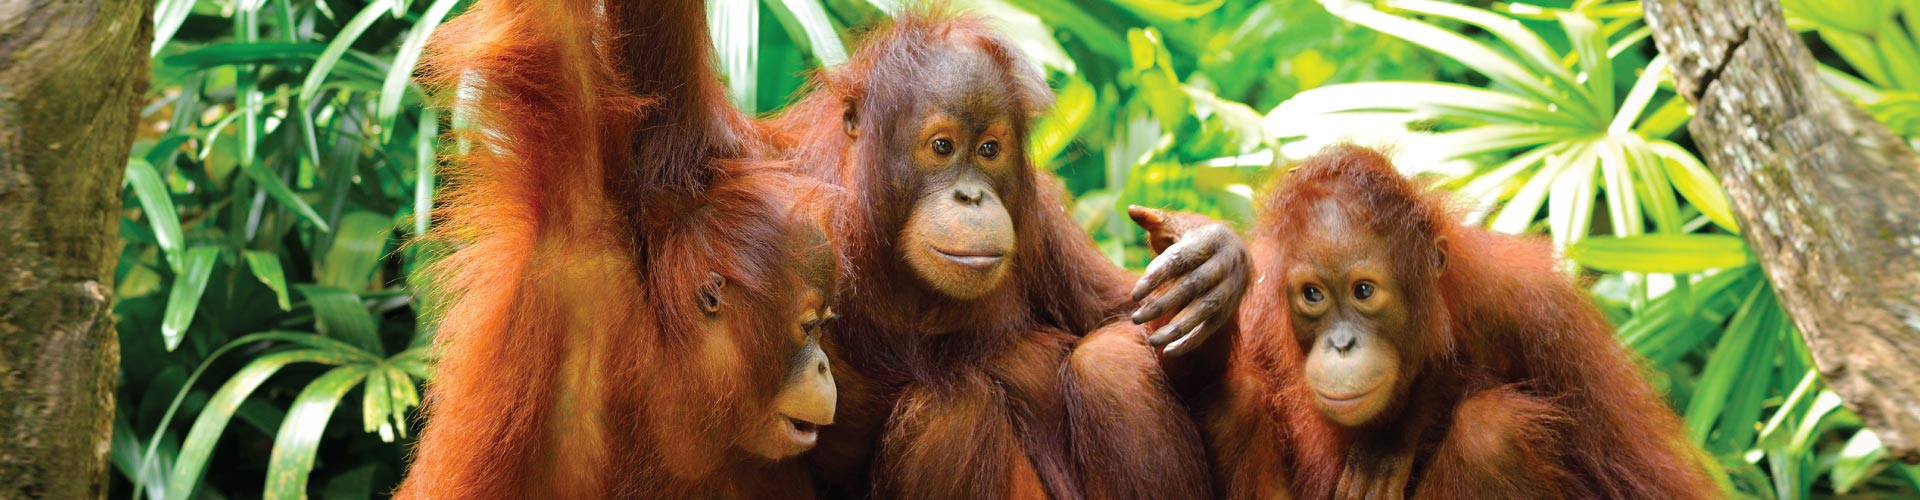 Orangutan & Kinabatangan River